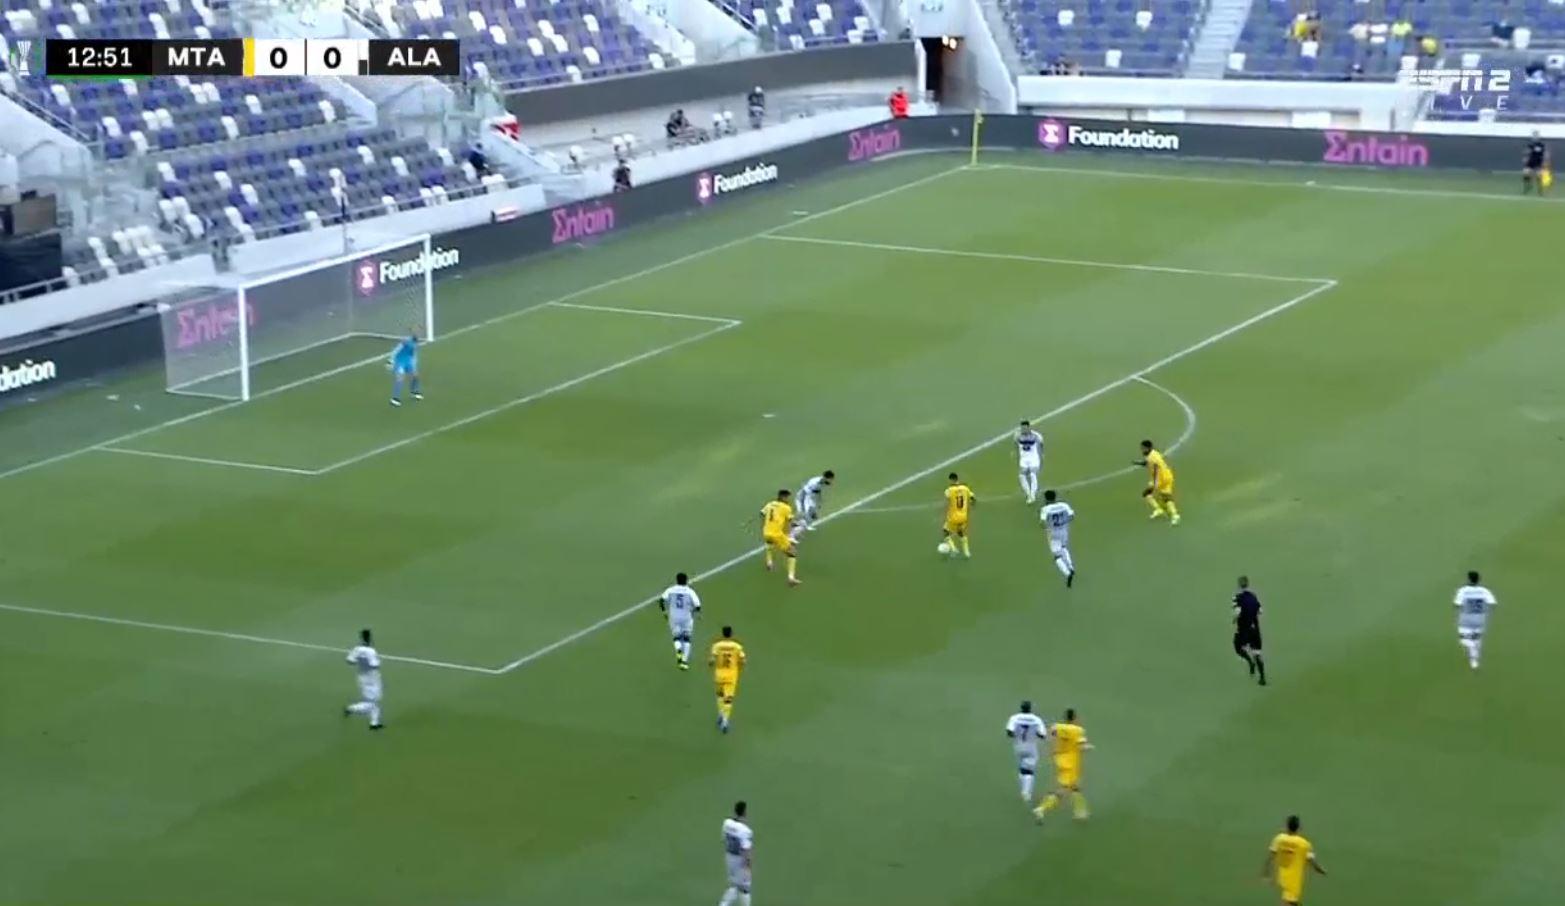 Maccabi Tel Aviv 4-1 Alashkert (2021.09.14) Watch Full Goals Highlight